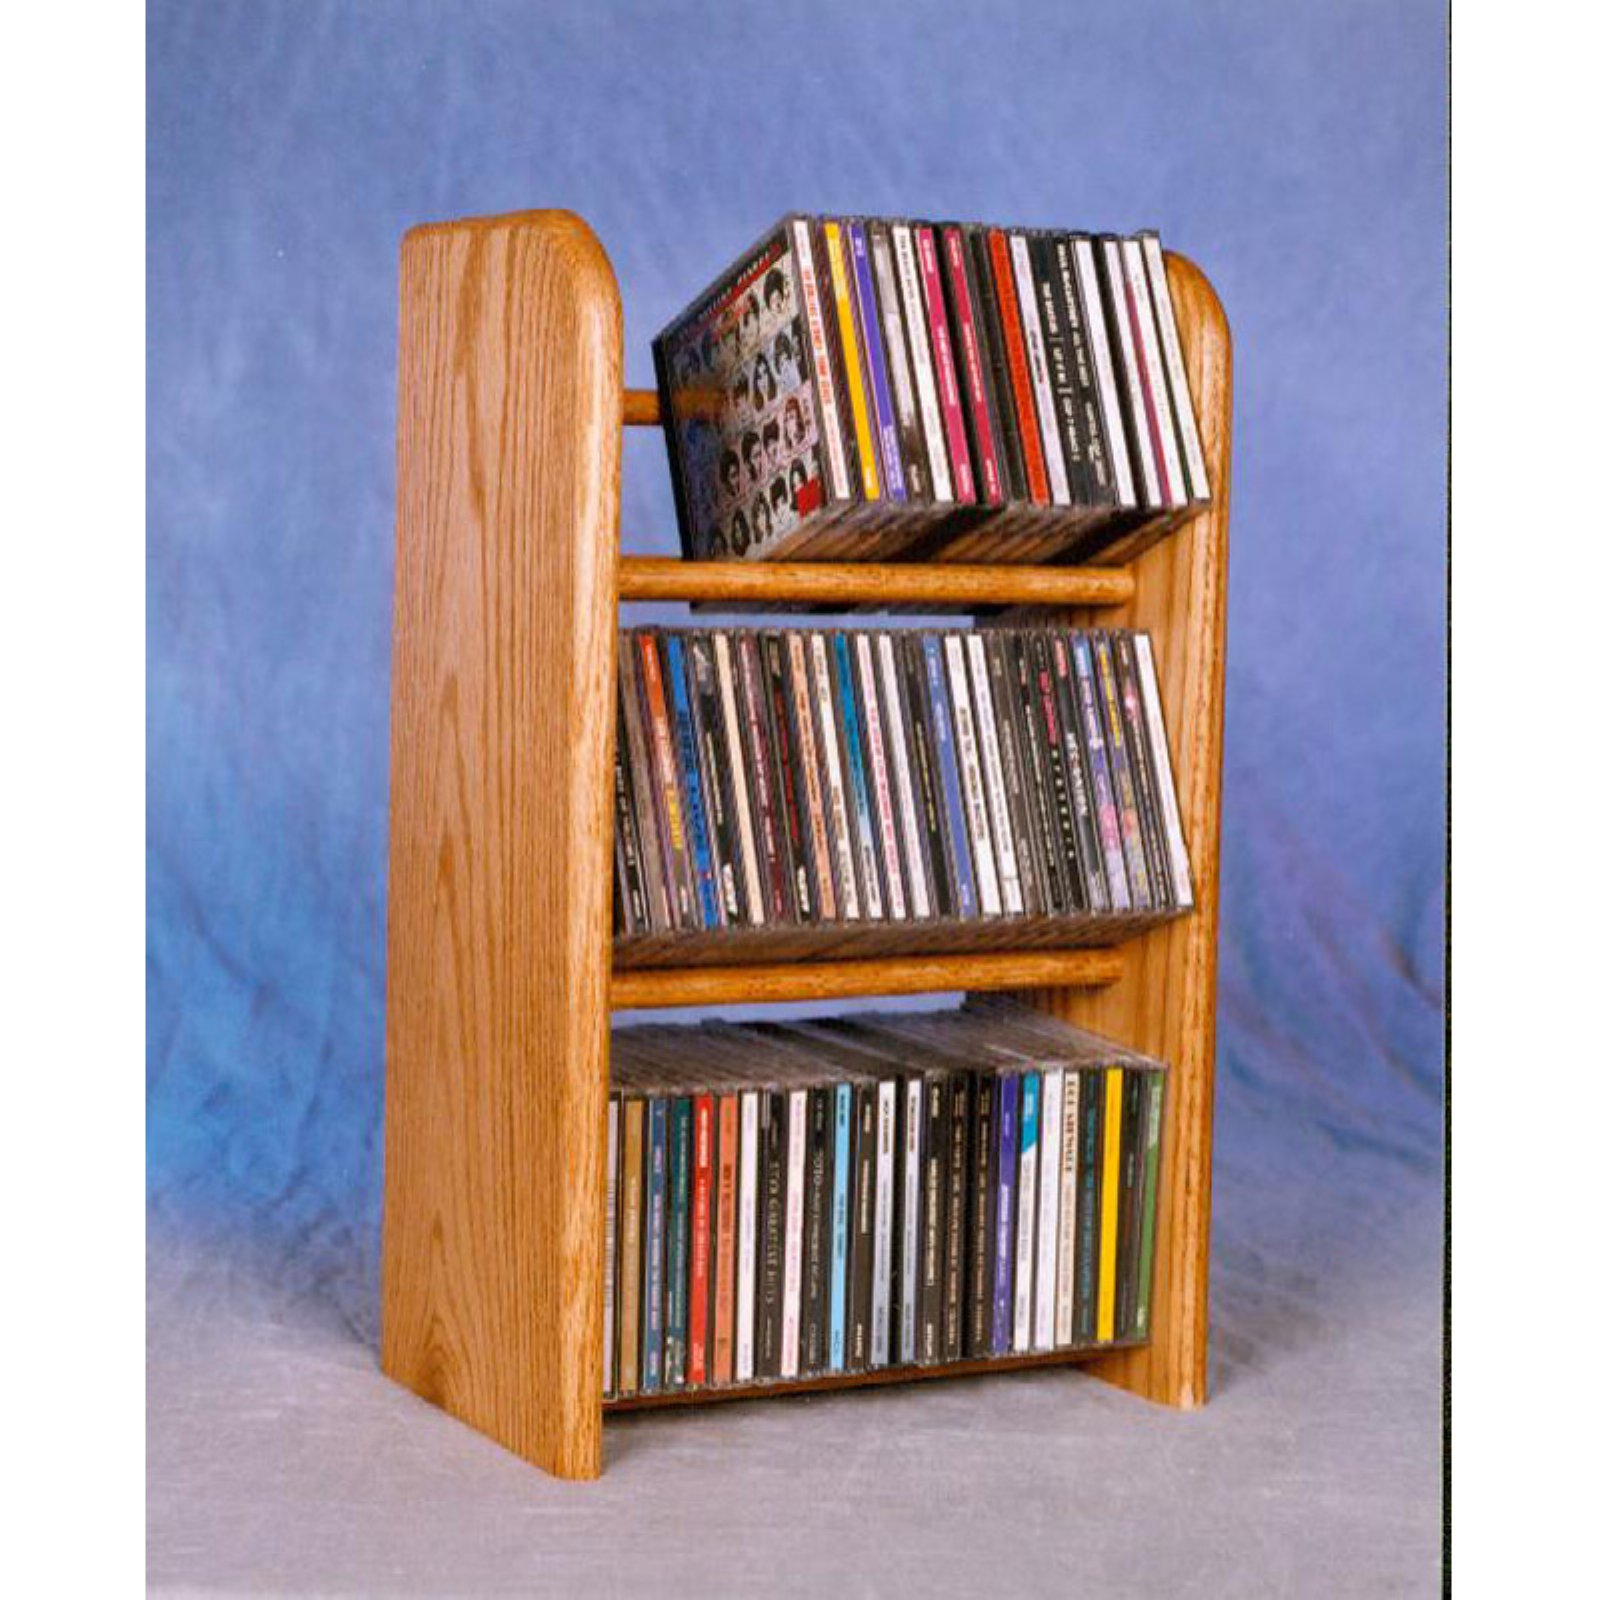 The Wood Shed Solid Oak 3 Row Dowel 78 CD Media Rack